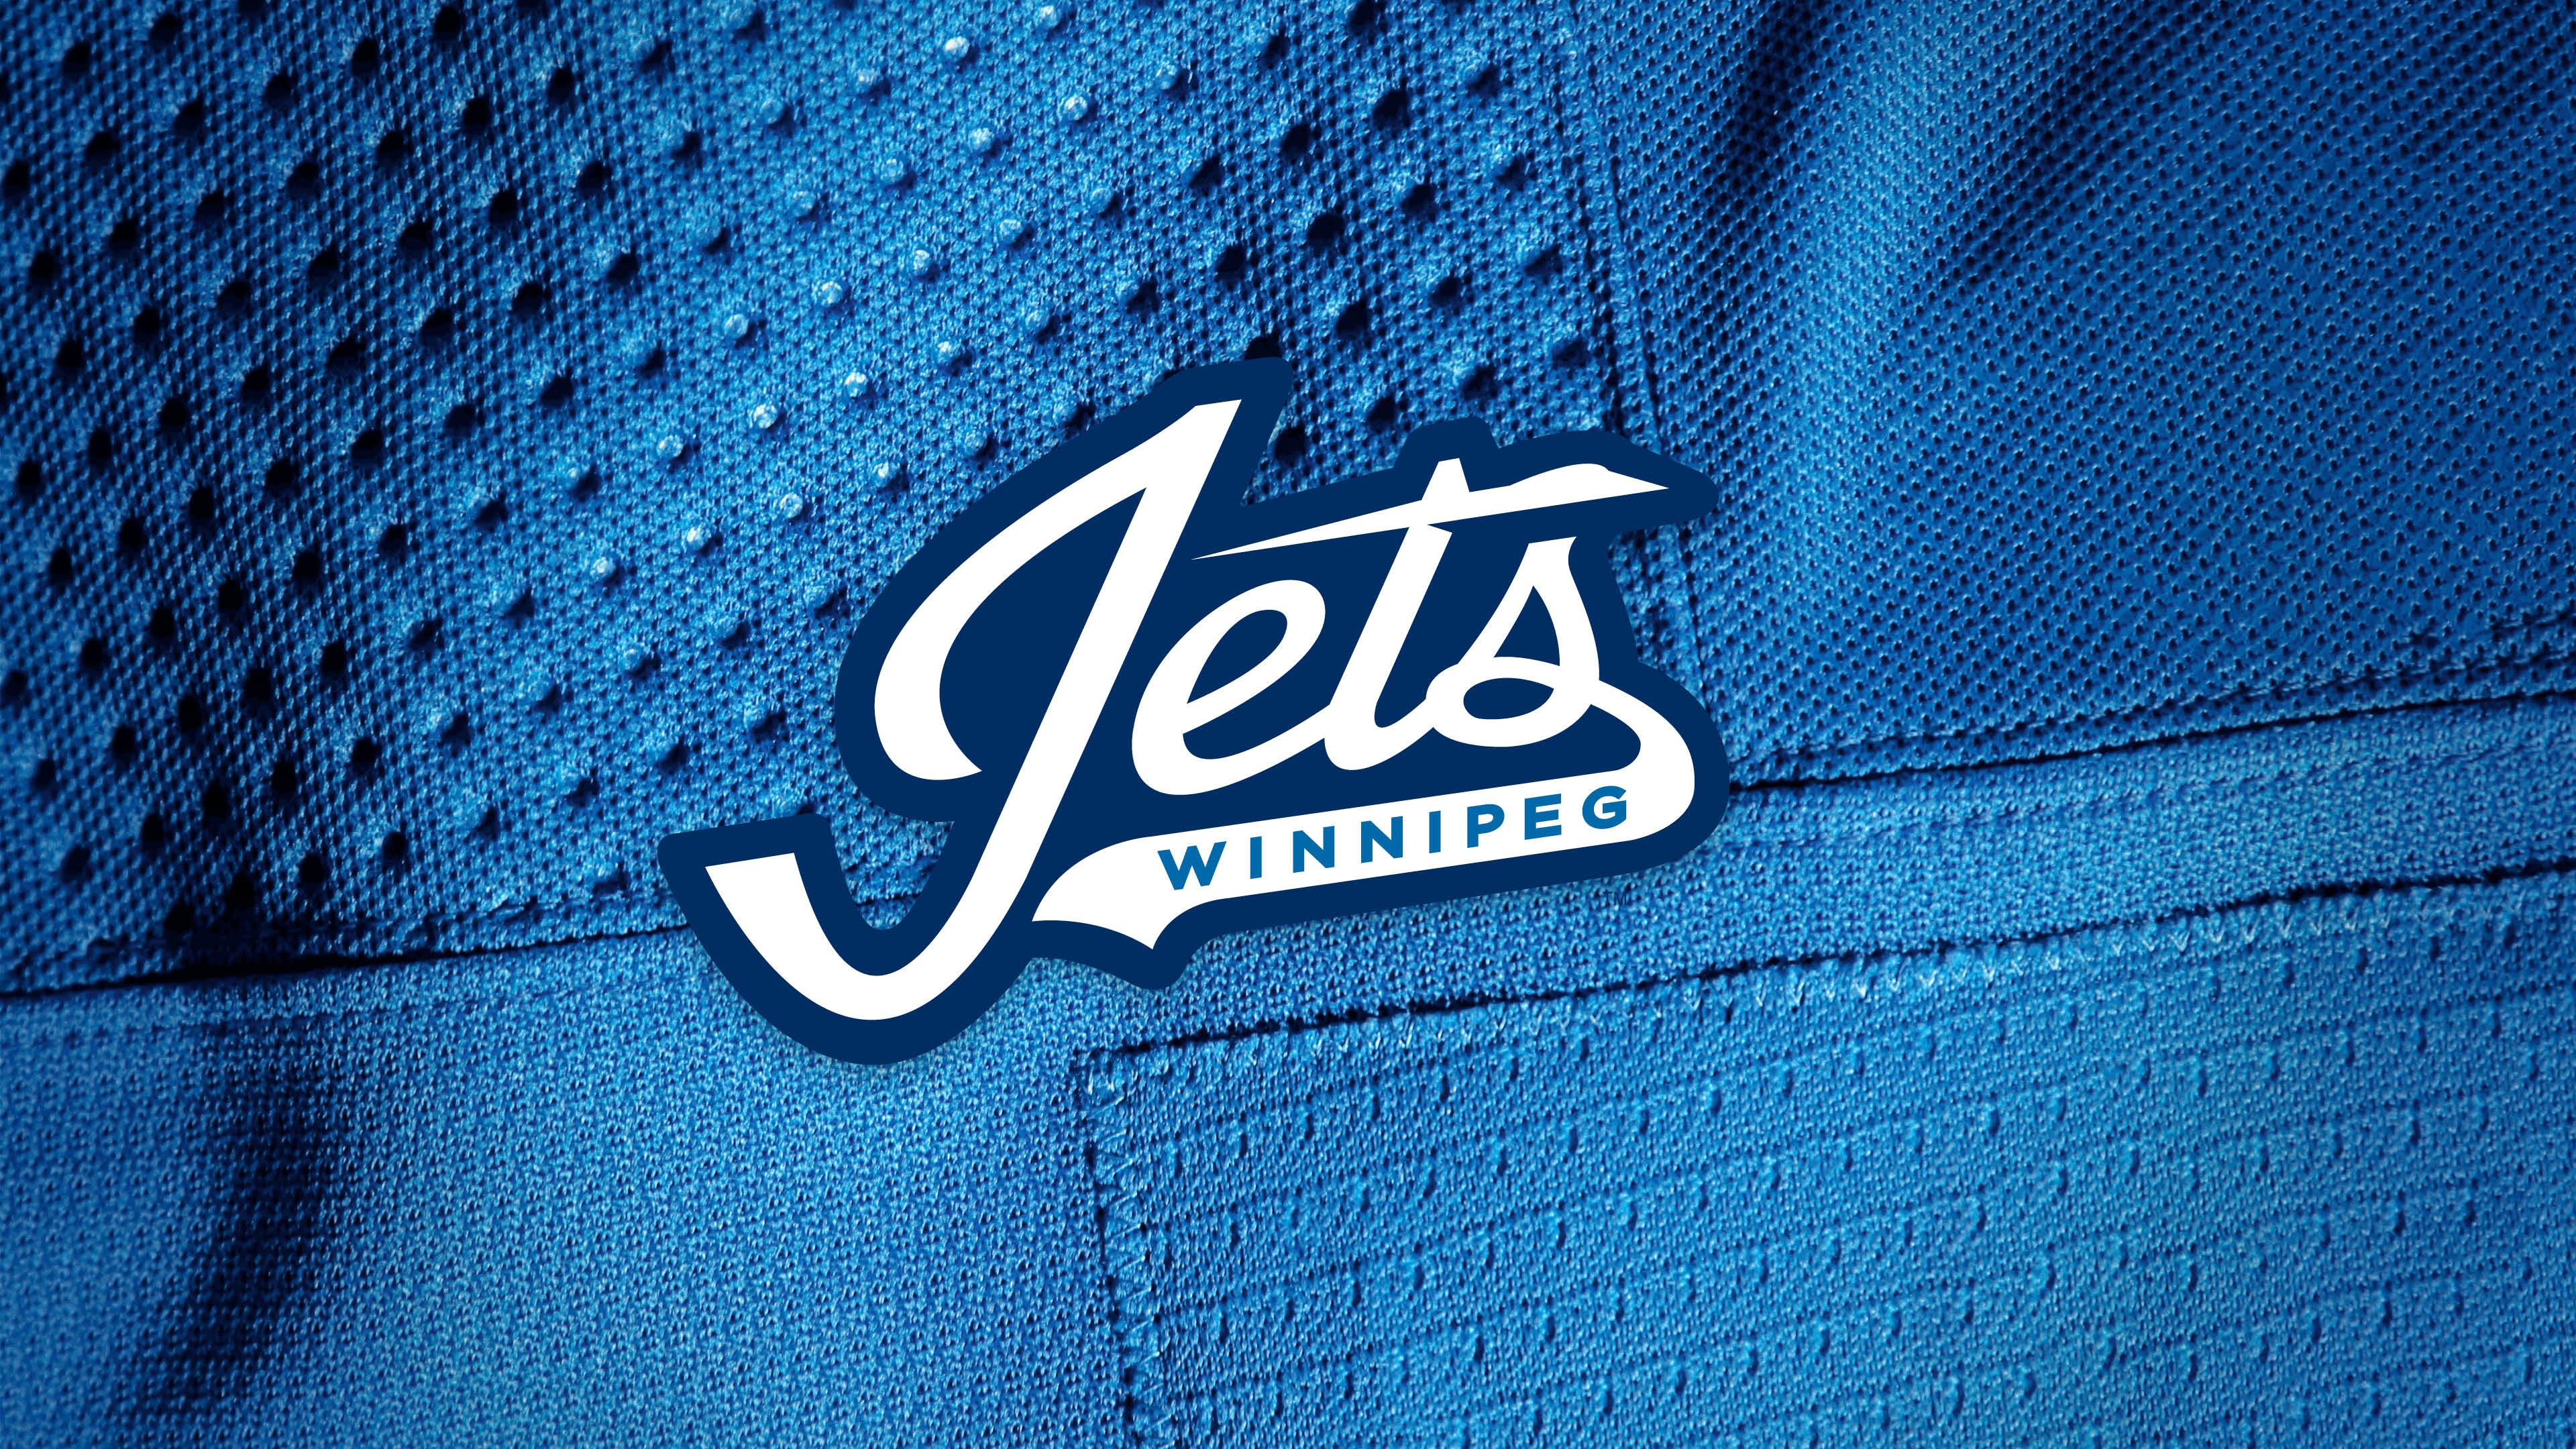 Desktop Mobile Wallpapers Winnipeg Jets 3840x2160